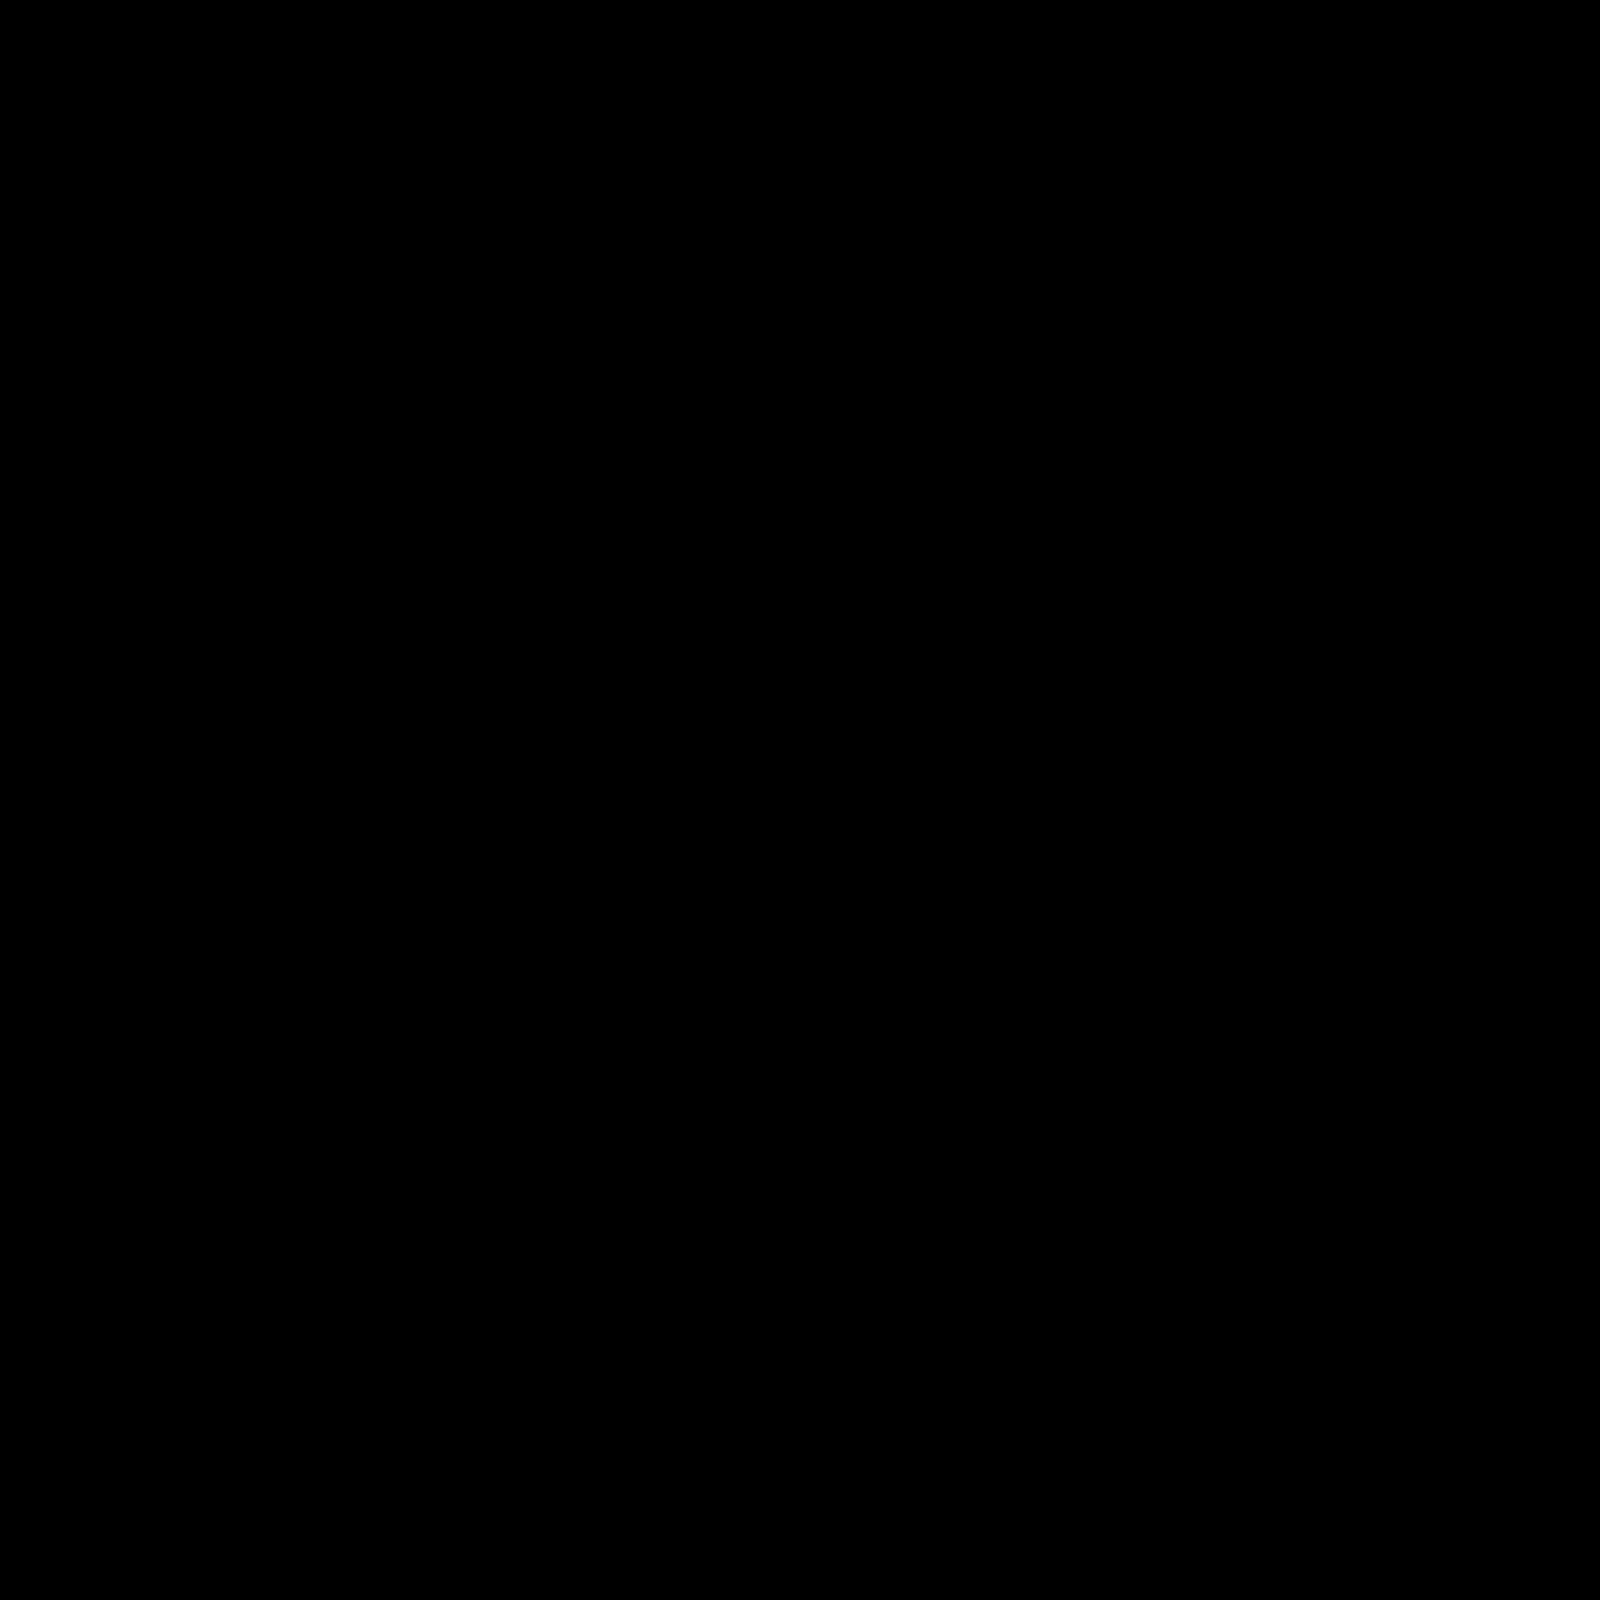 Frozen Window icon